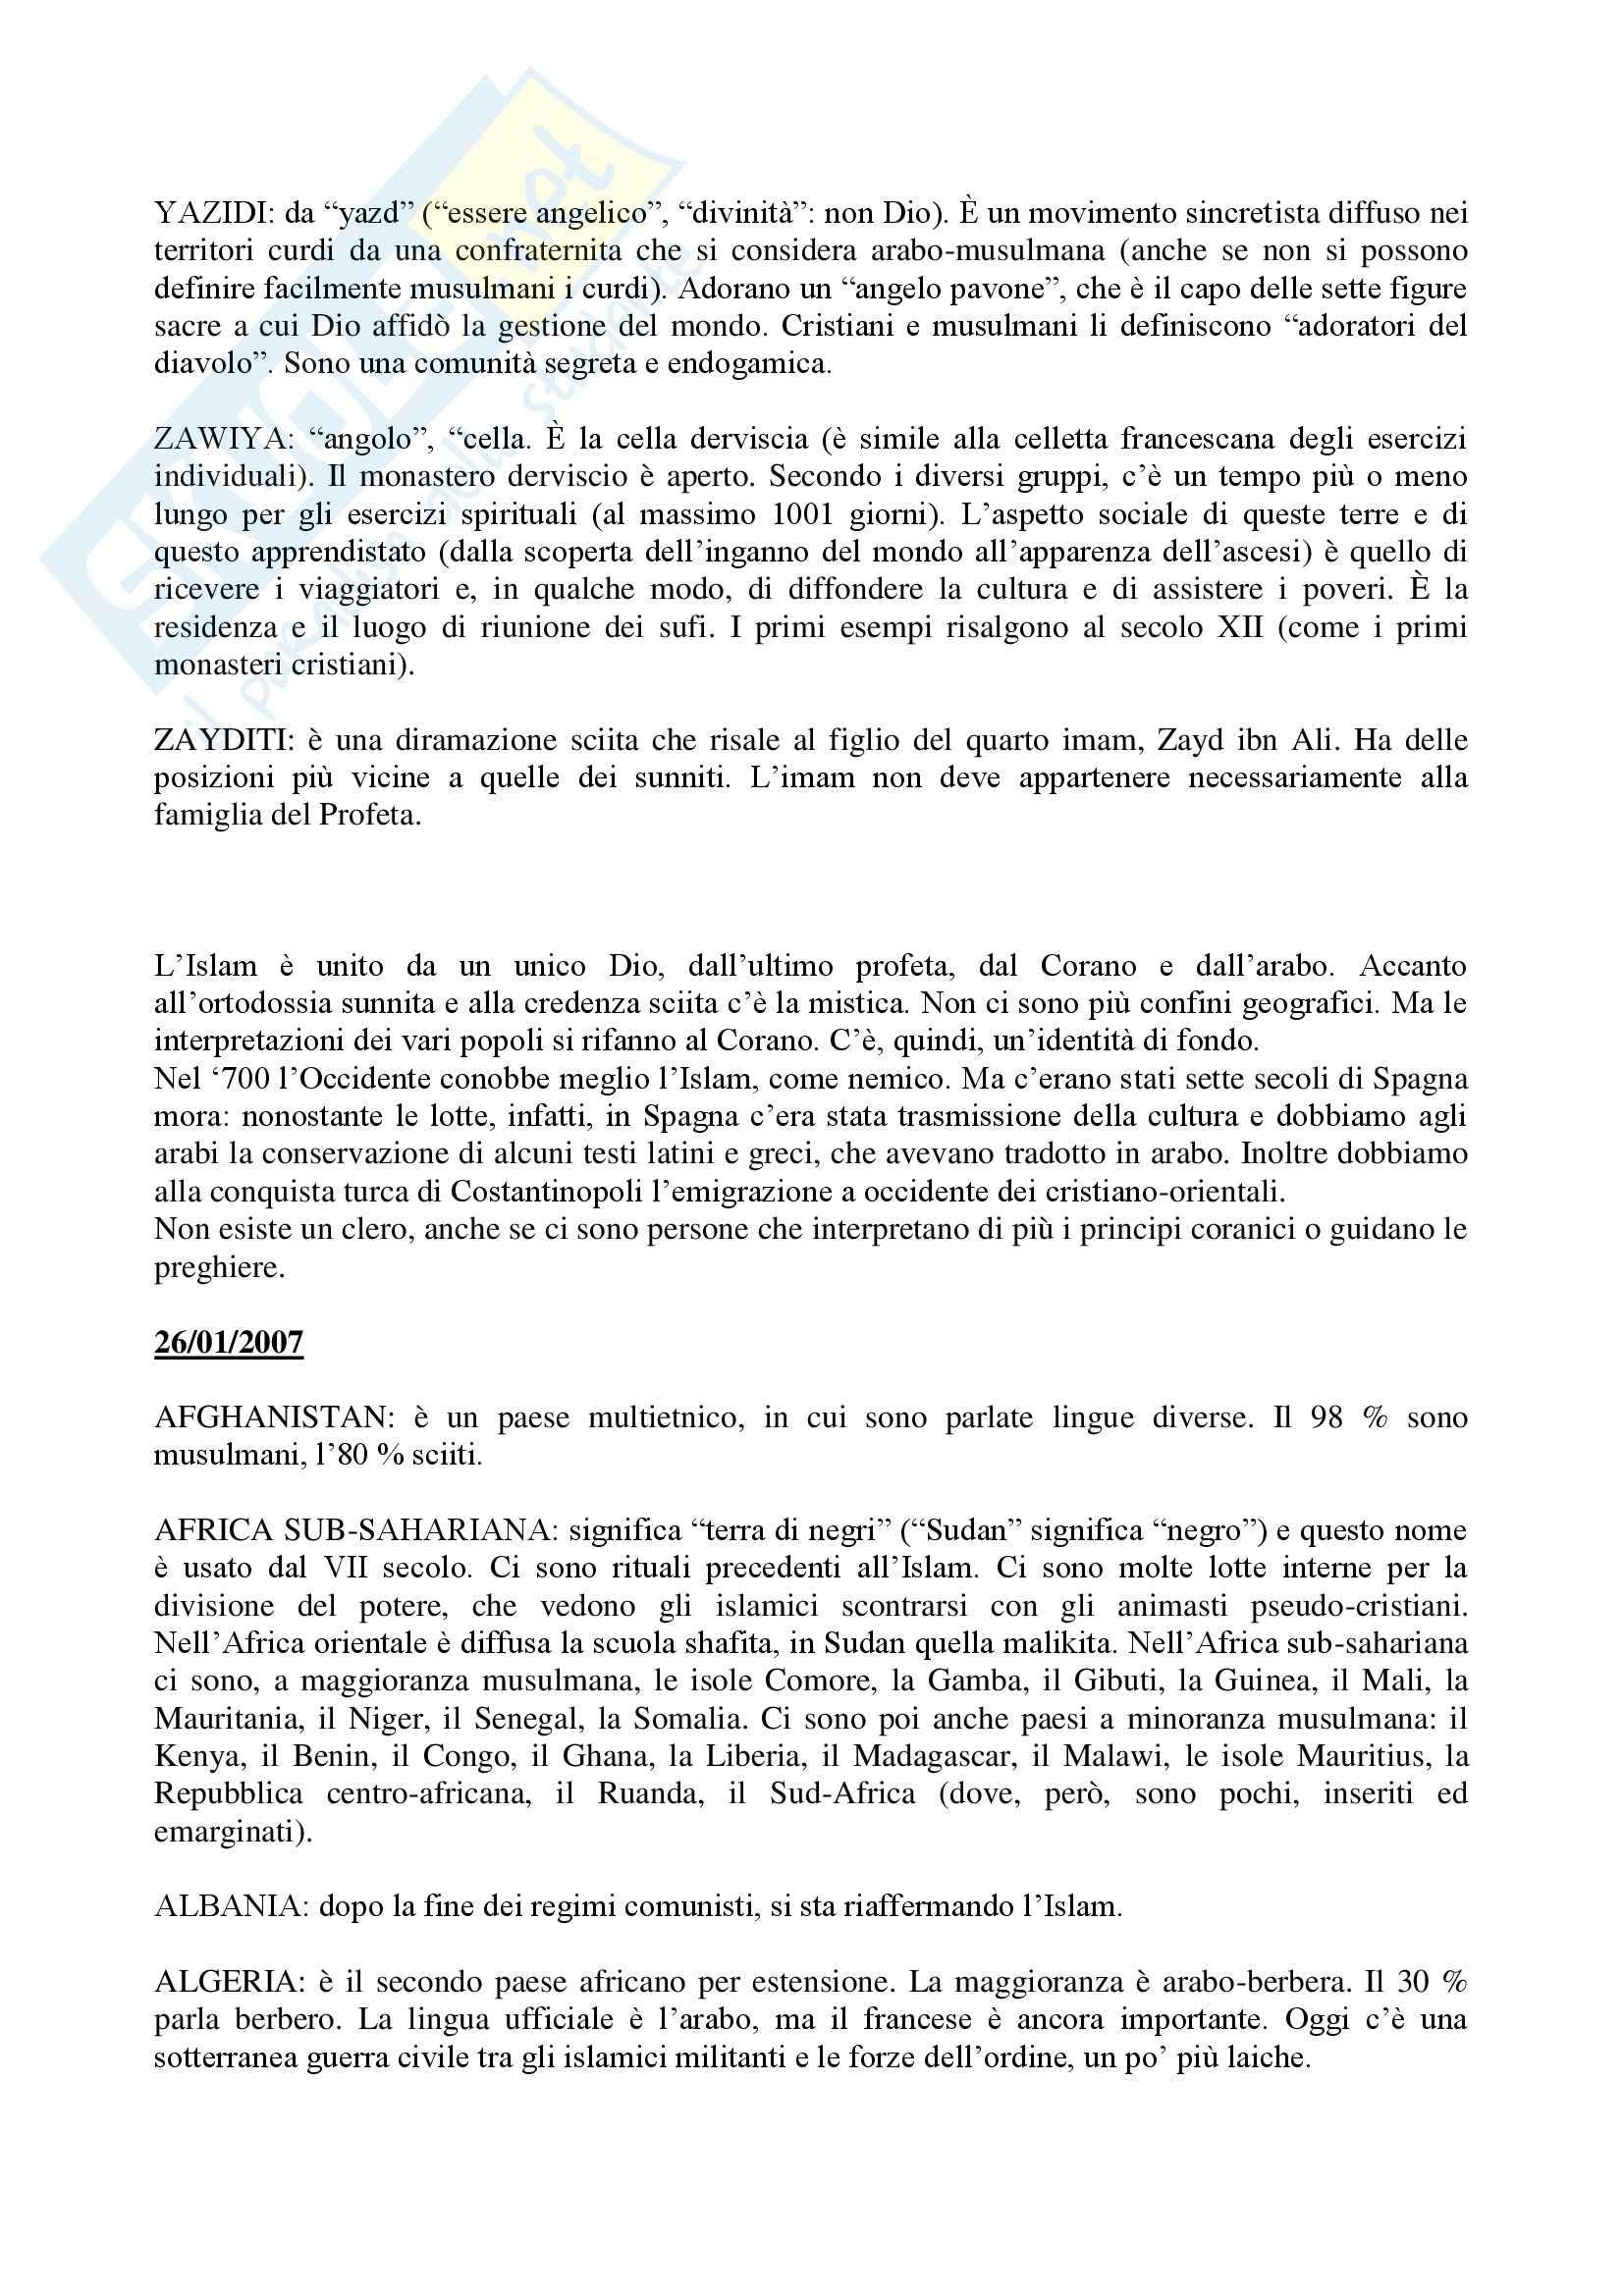 Storia dei Paesi islamici - Appunti Pag. 26